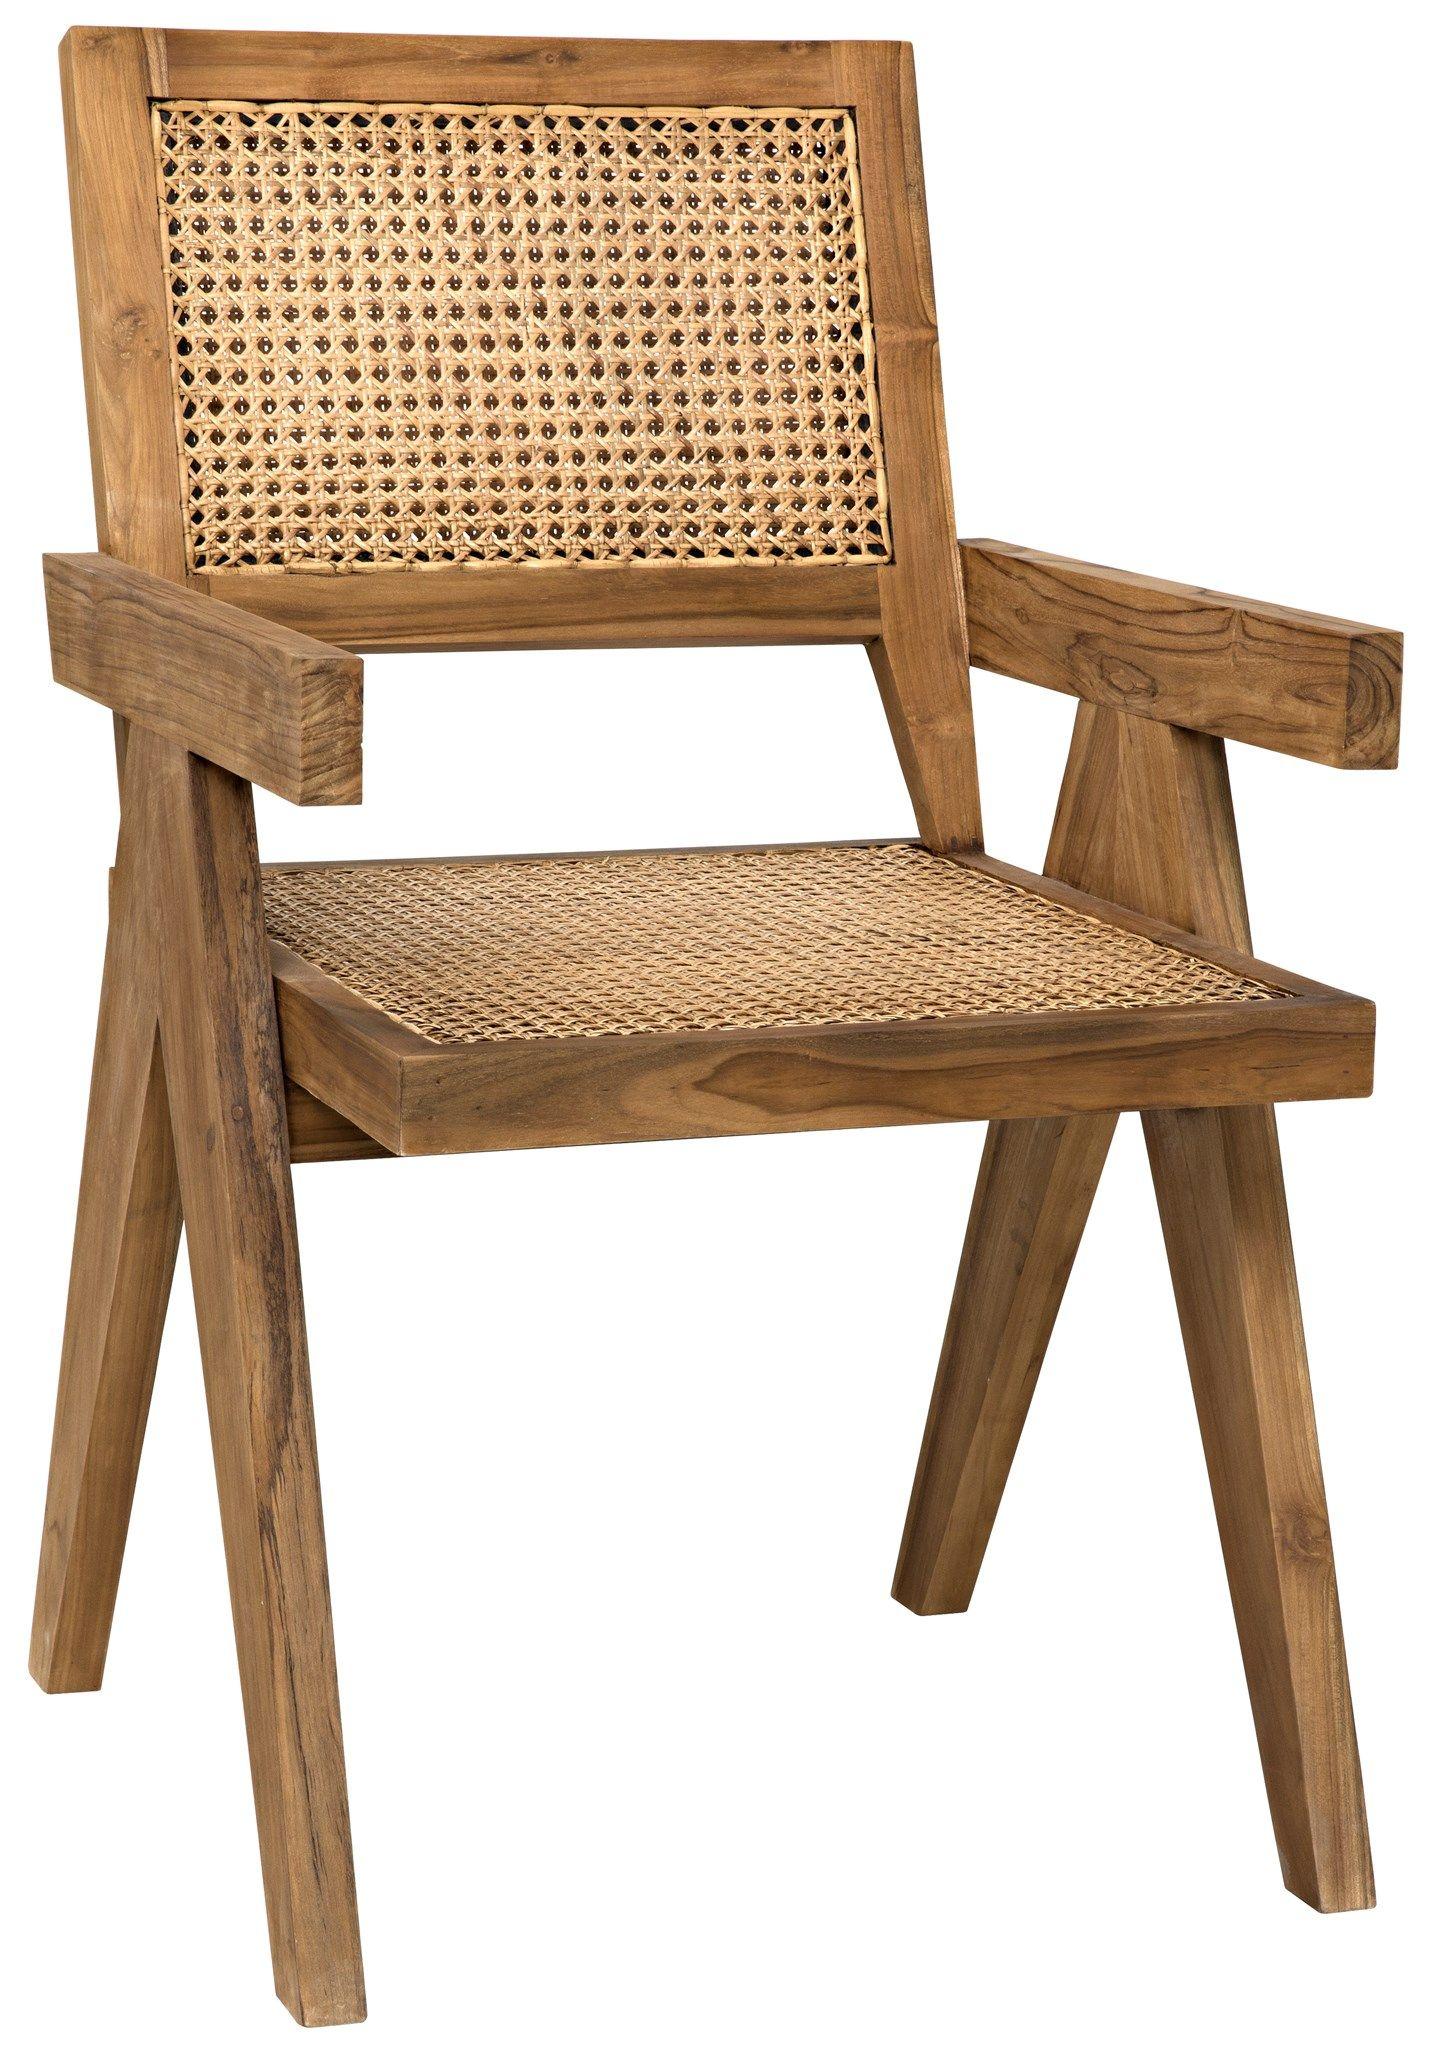 Jake Teak and Cane Arm Chair Mid-Century Modern Style Teak Frame ...